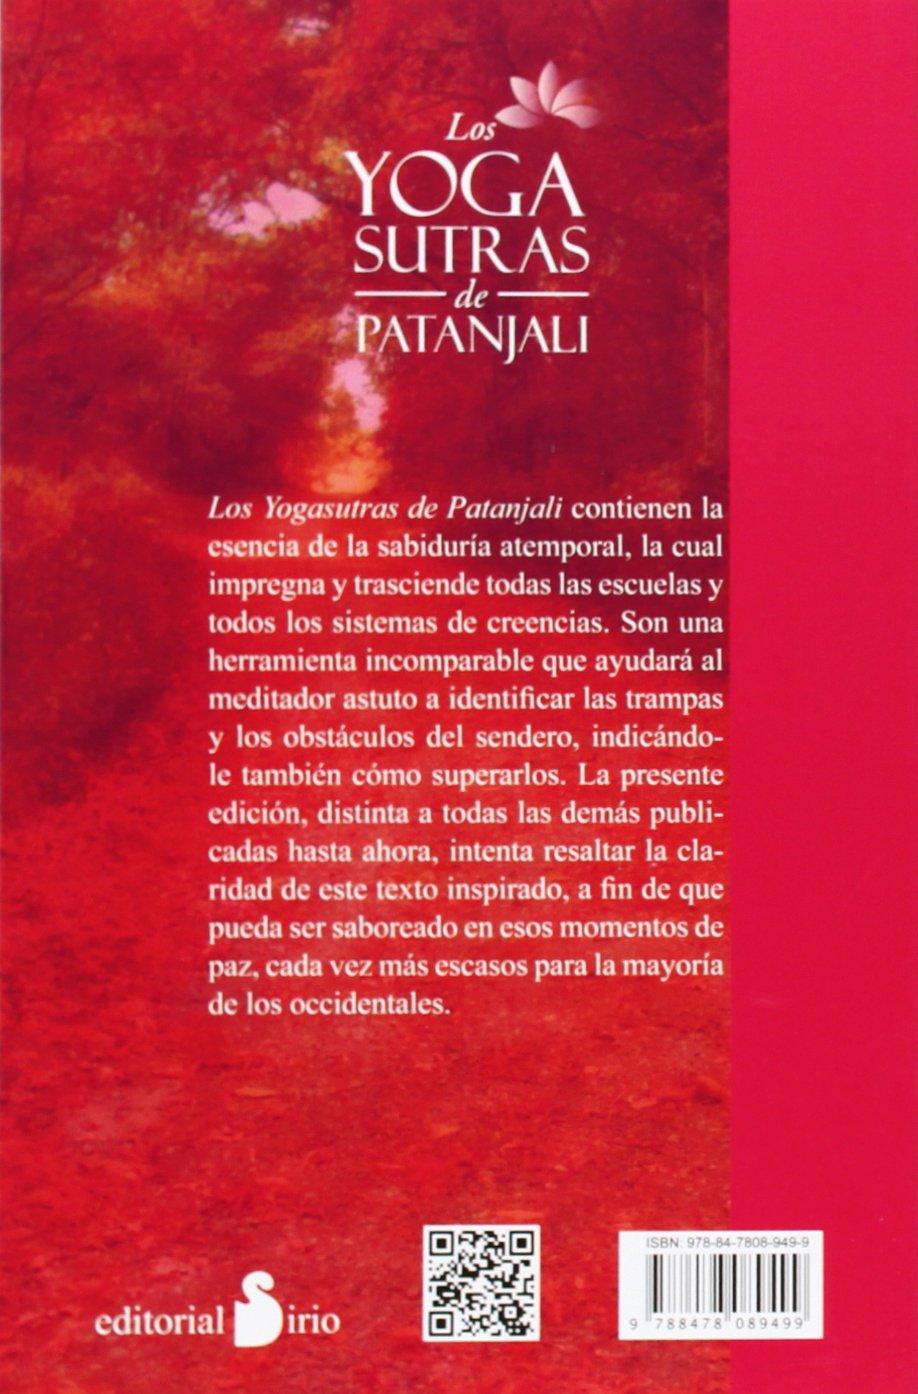 Los yogasutras de Patanjali (Spanish Edition): Patanjali ...